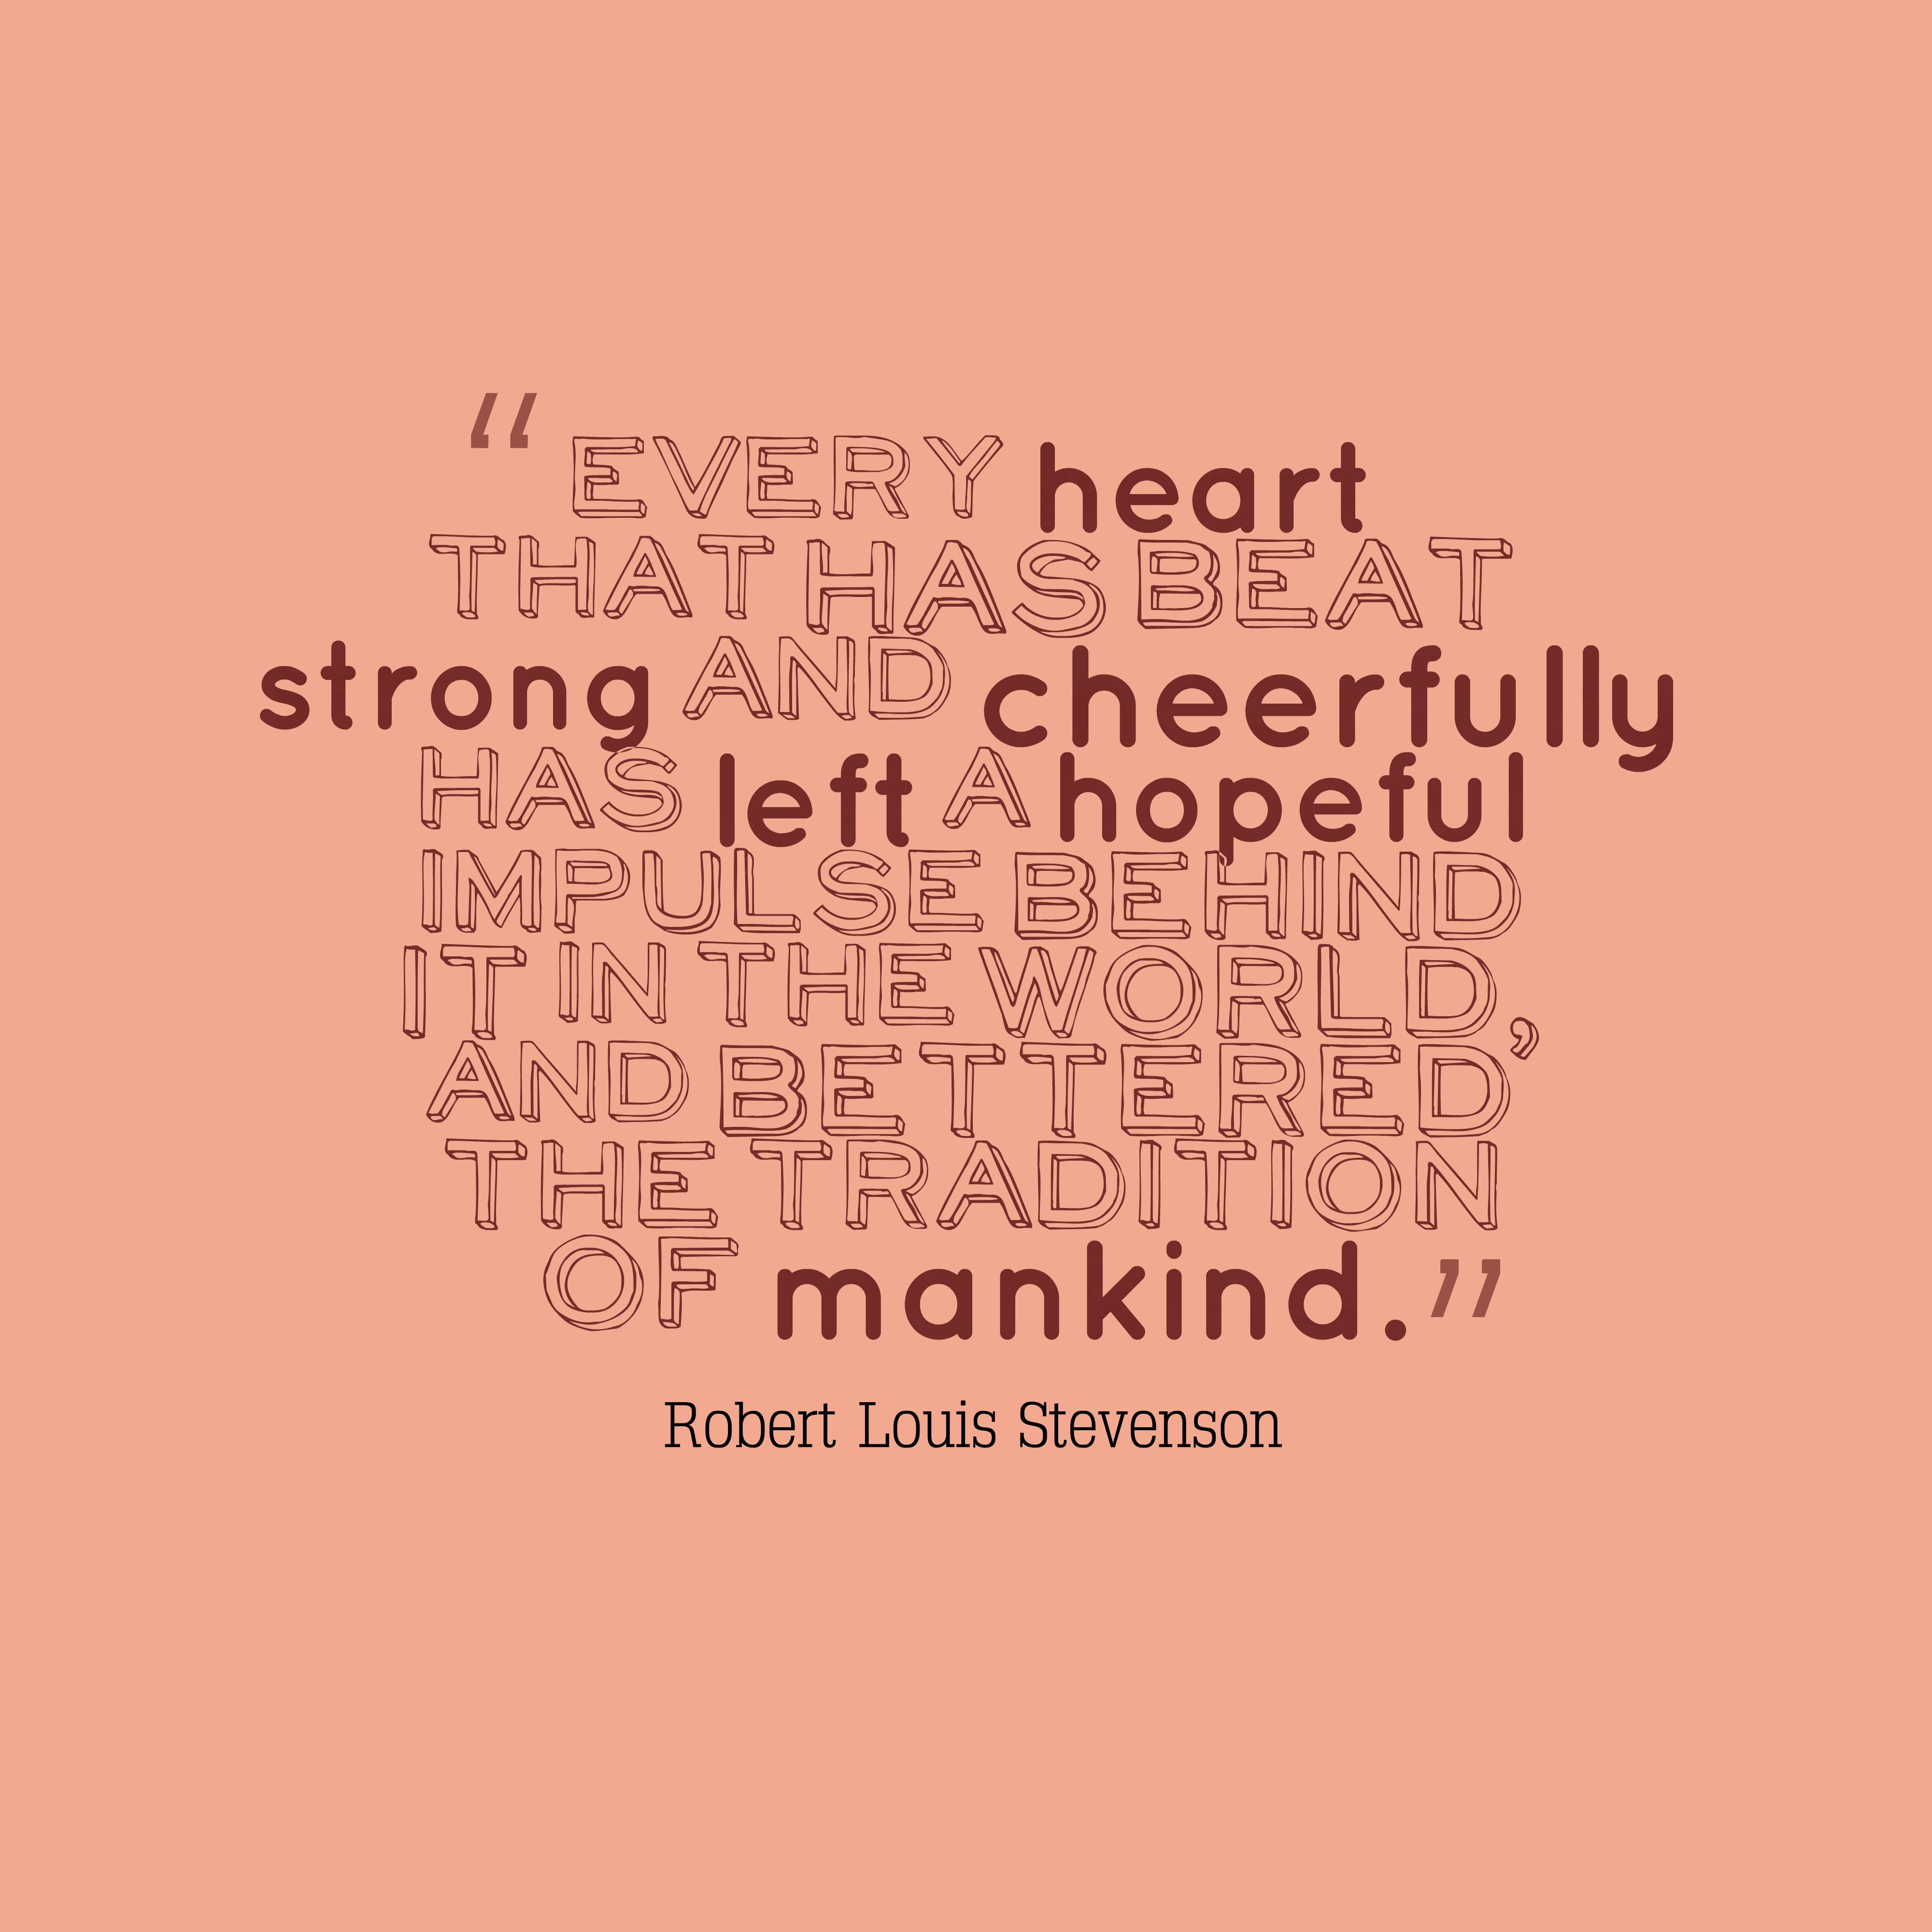 Picture Robert Louis Stevenson Quote About Judge: Robert Louis Stevenson Quote About Hope